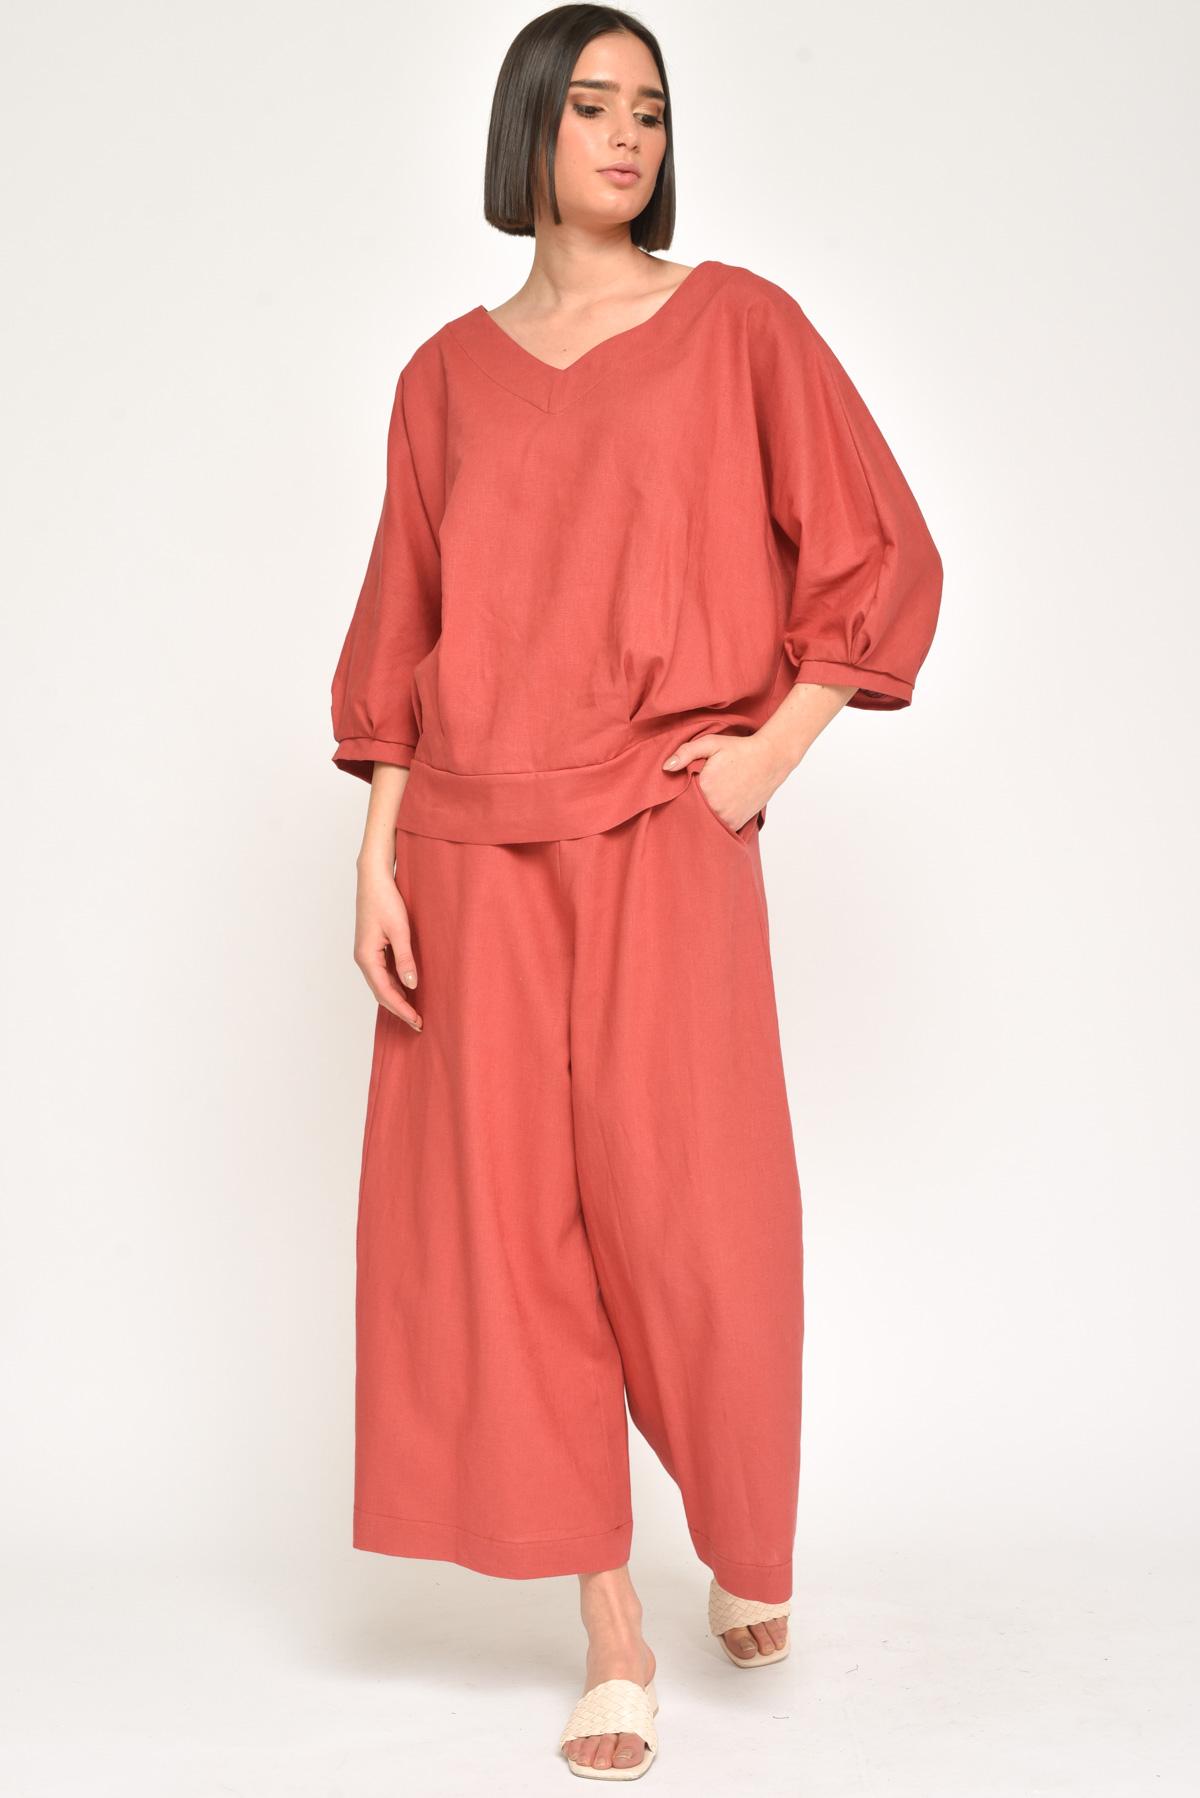 PANTALONI CROPPED GAMBA LARGA  IN VISCOSA E LINO  for women - RED - Paquito Pronto Moda Shop Online